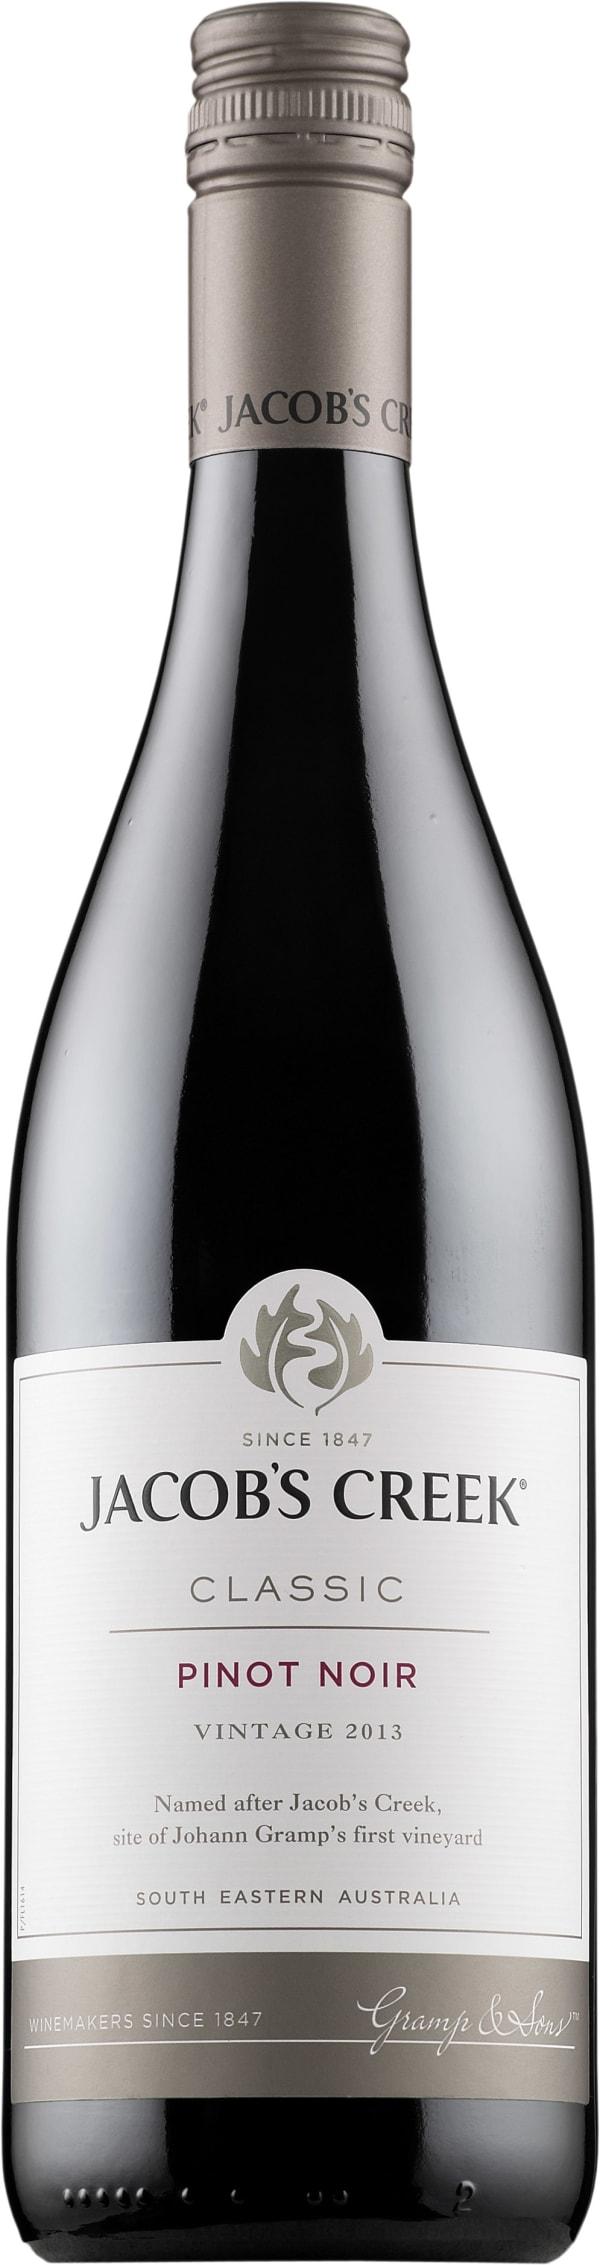 Jacob's Creek Pinot Noir 2016